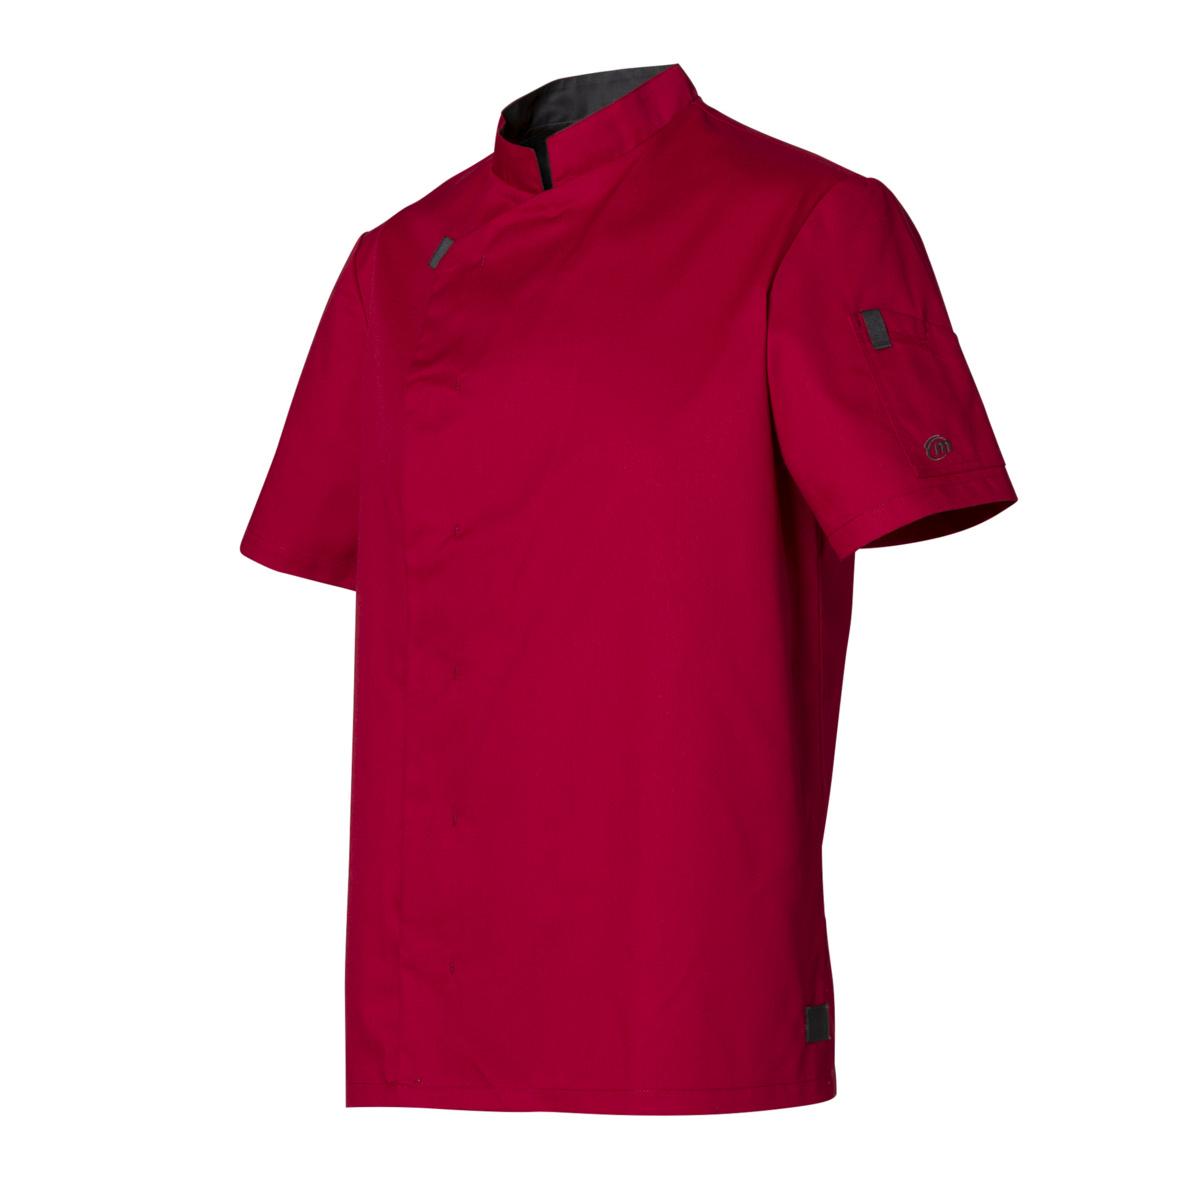 Veste de cuisine rouge taille 2 Shade Molinel